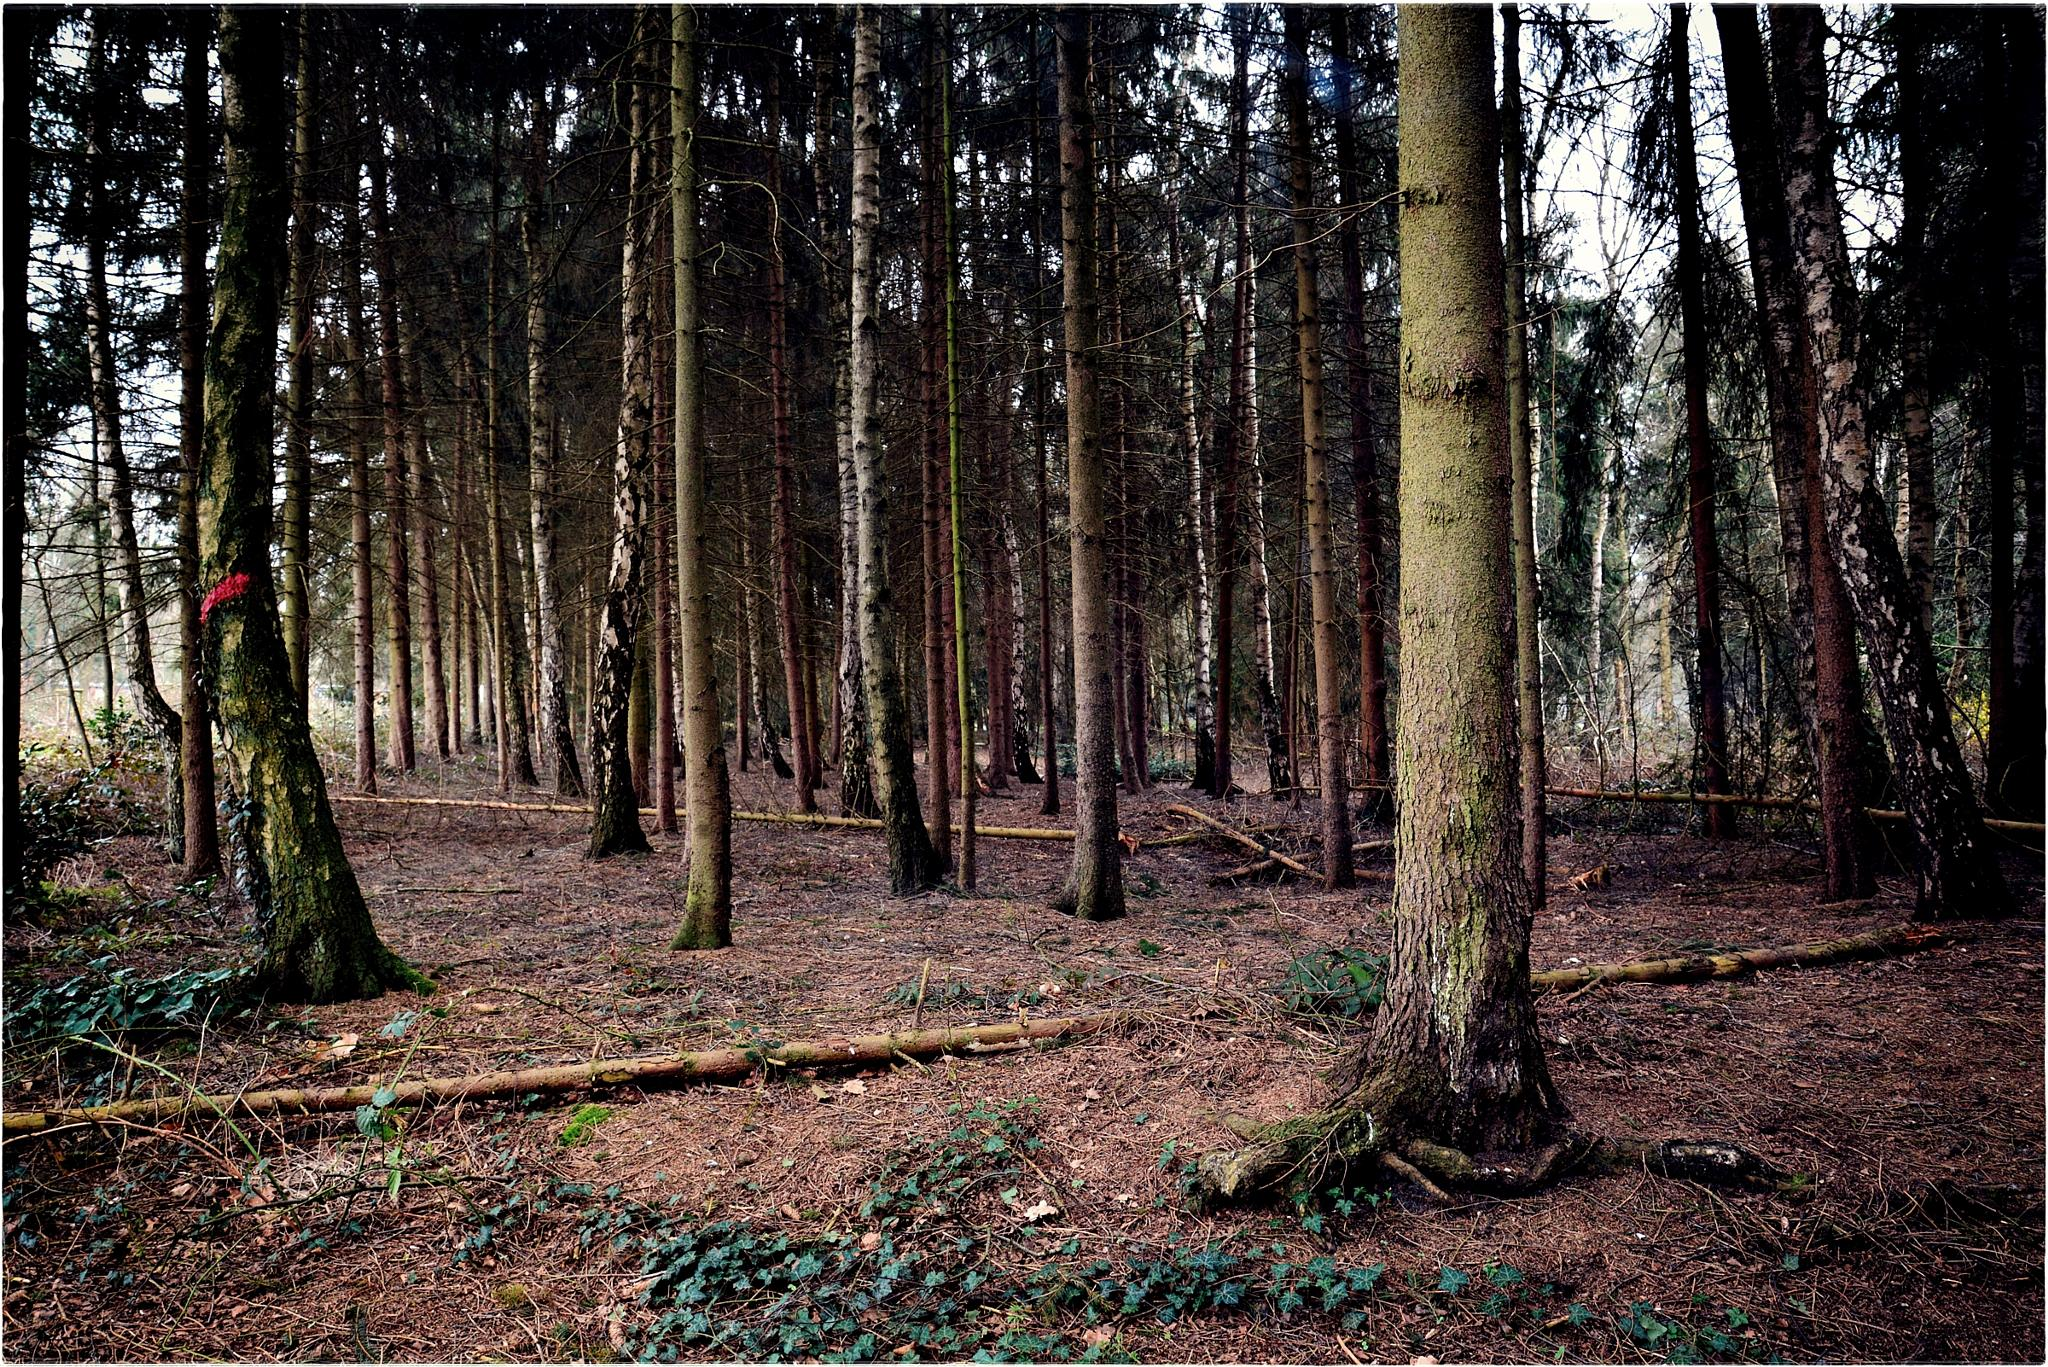 Dark Forest in springtime by shadow